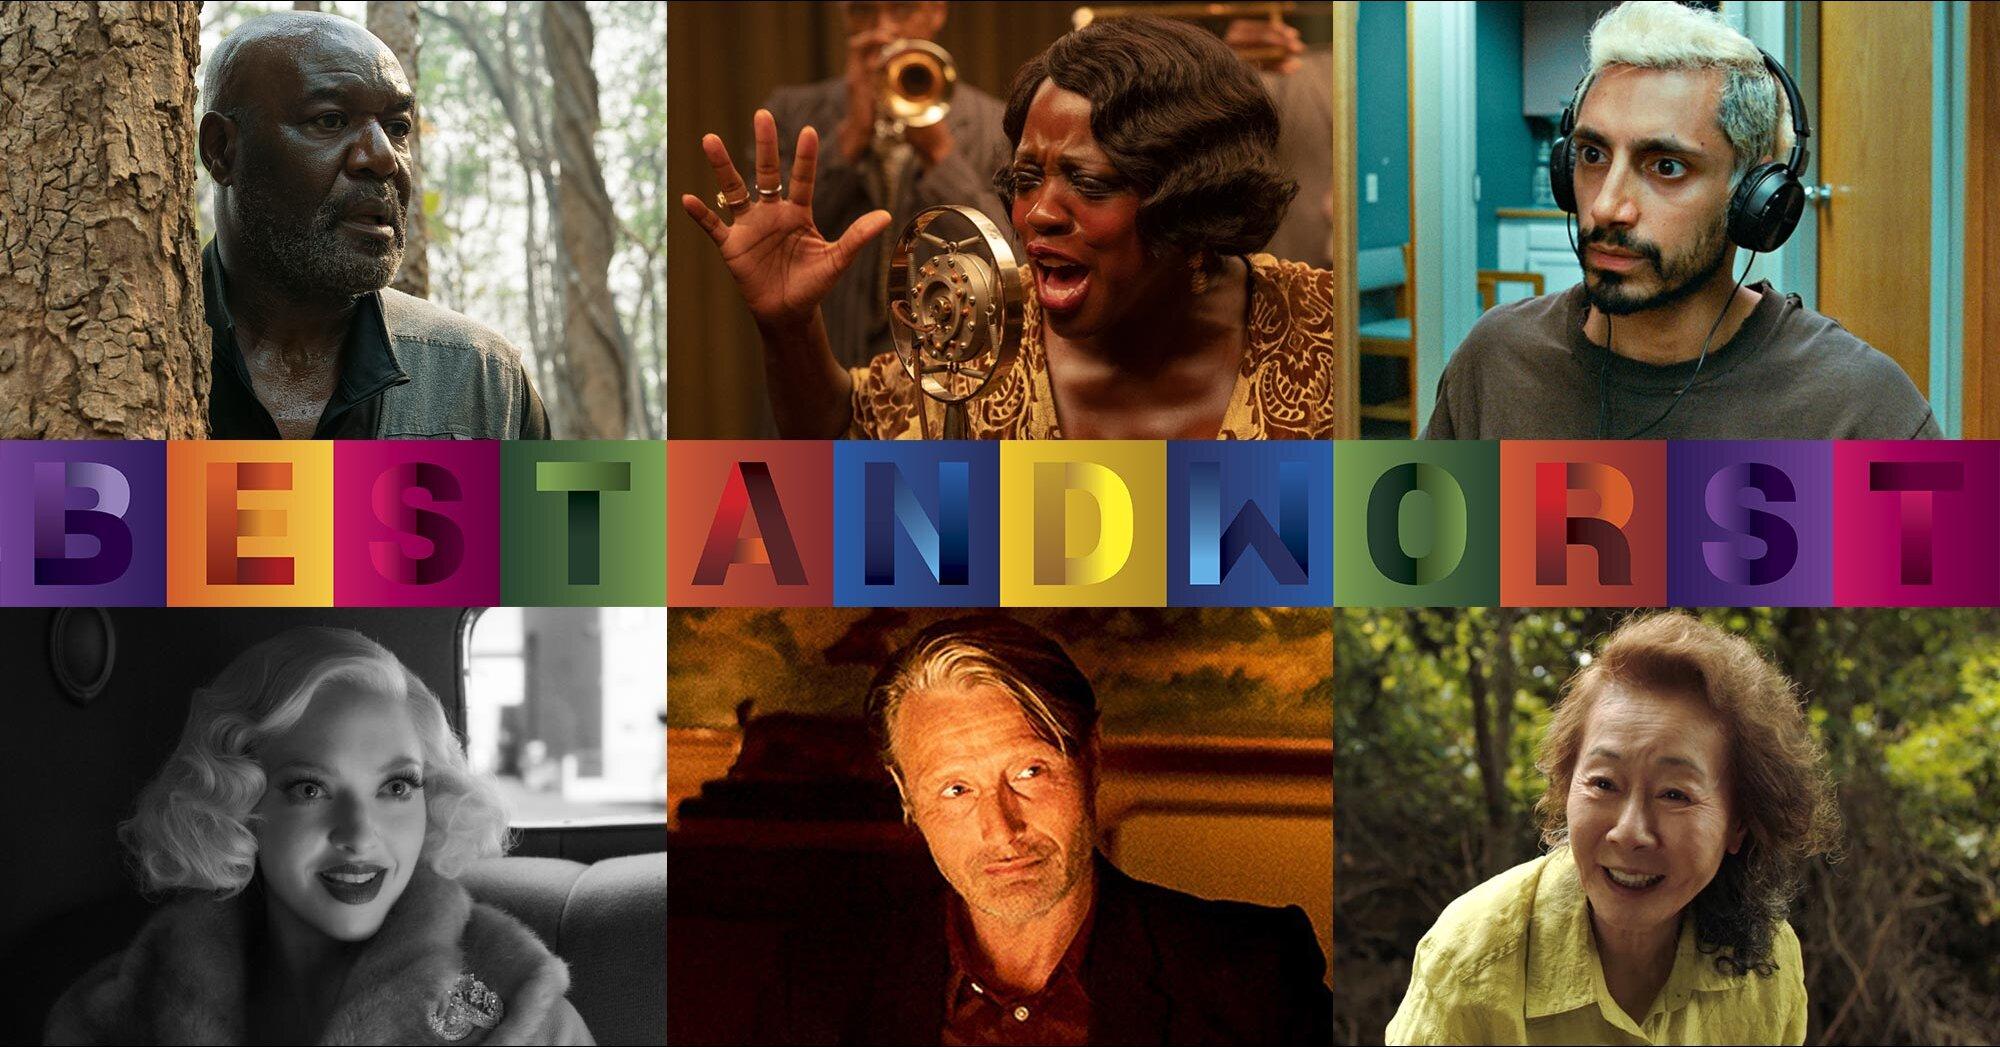 The 15 best film performances of 2020